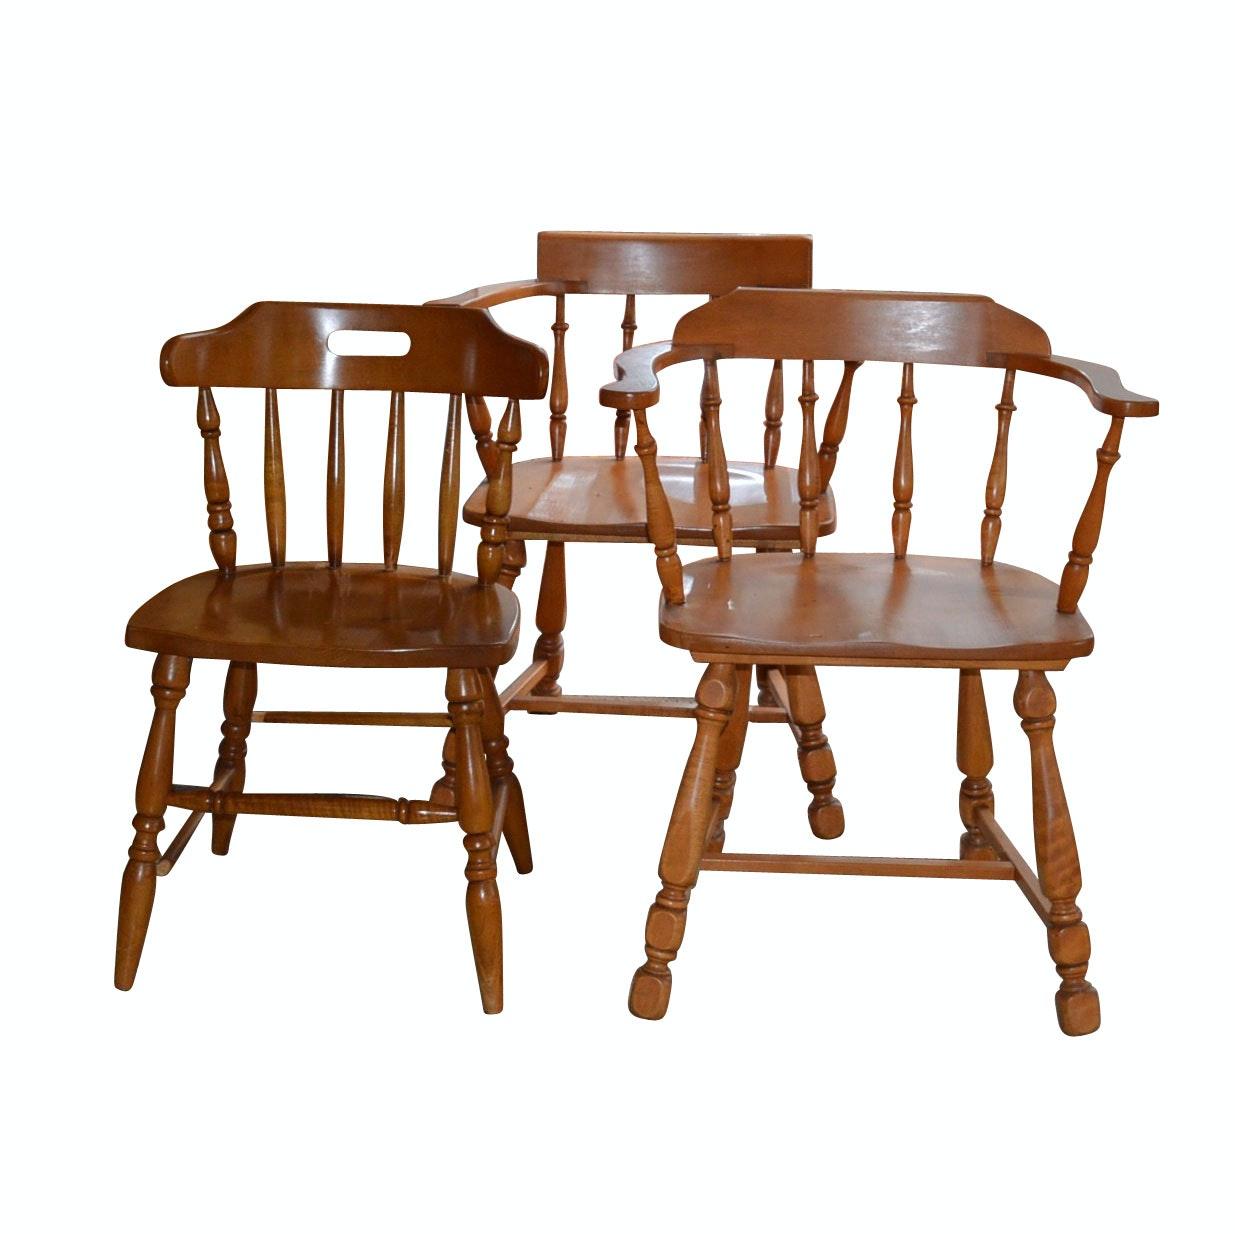 Three Vintage Maple Chairs